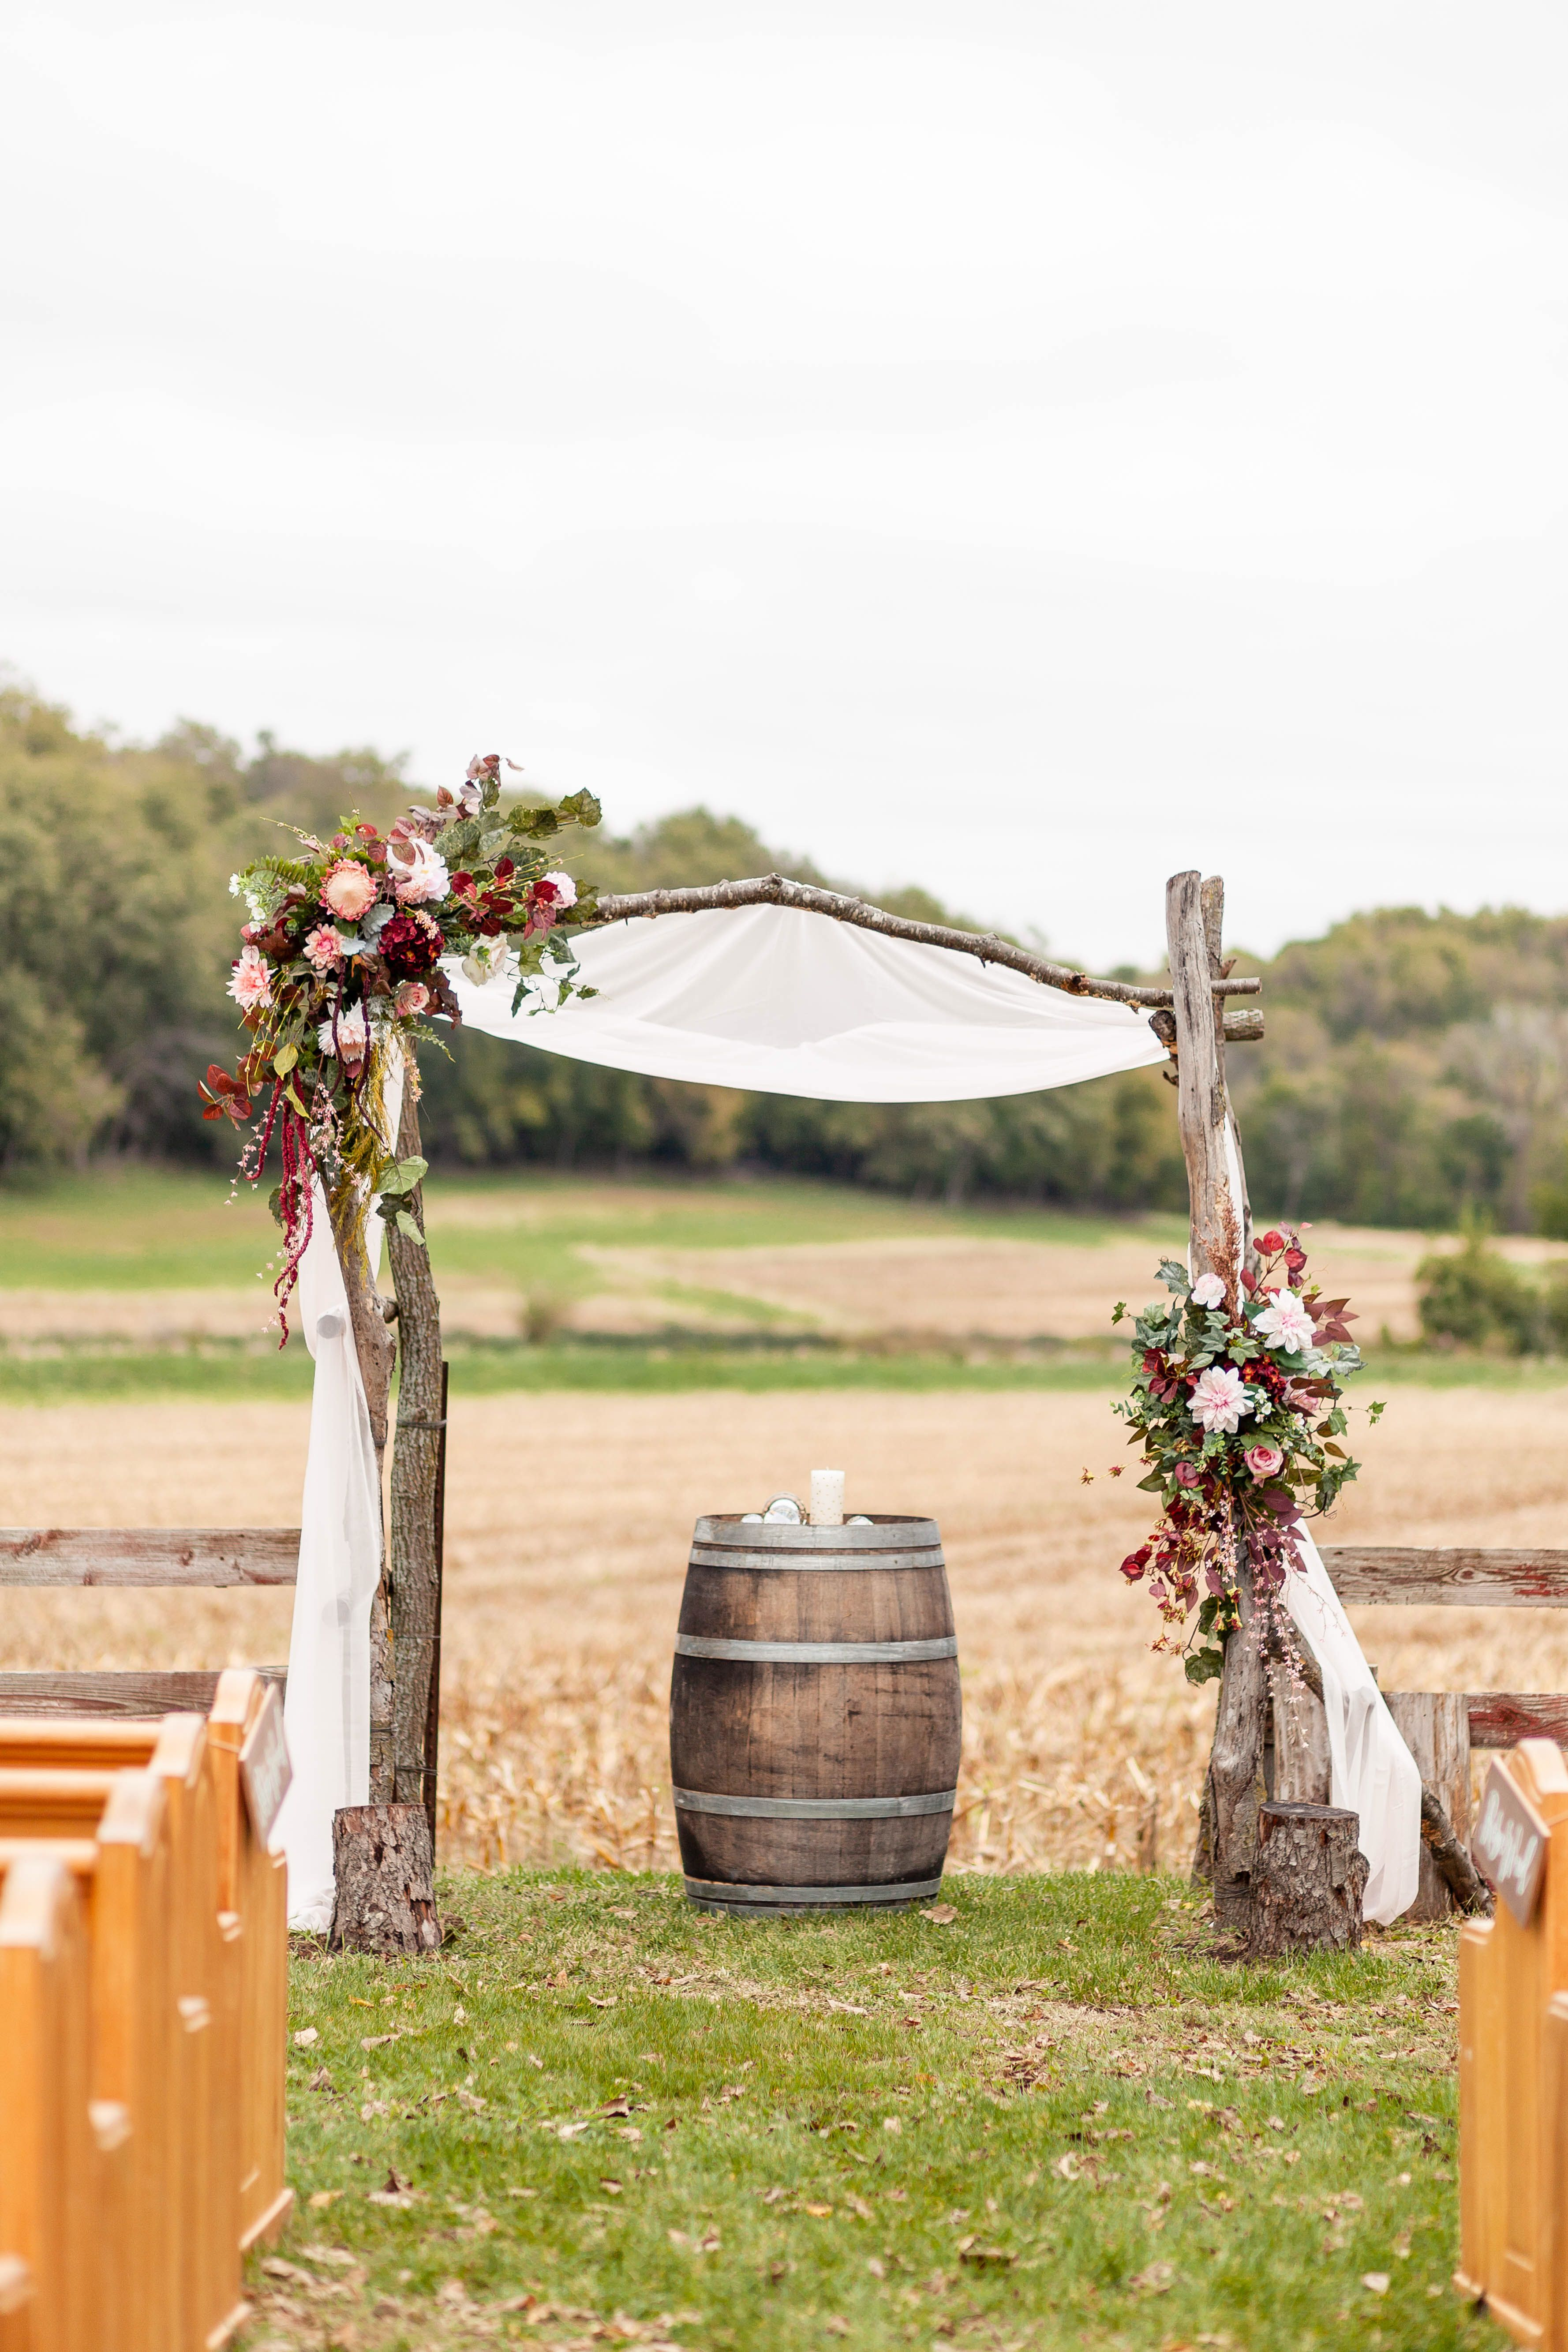 Rustic Outdoor Ceremony Decor Ceremony Decorations Outdoor Wedding Photographer Chicago Chicago Suburbs Wedding